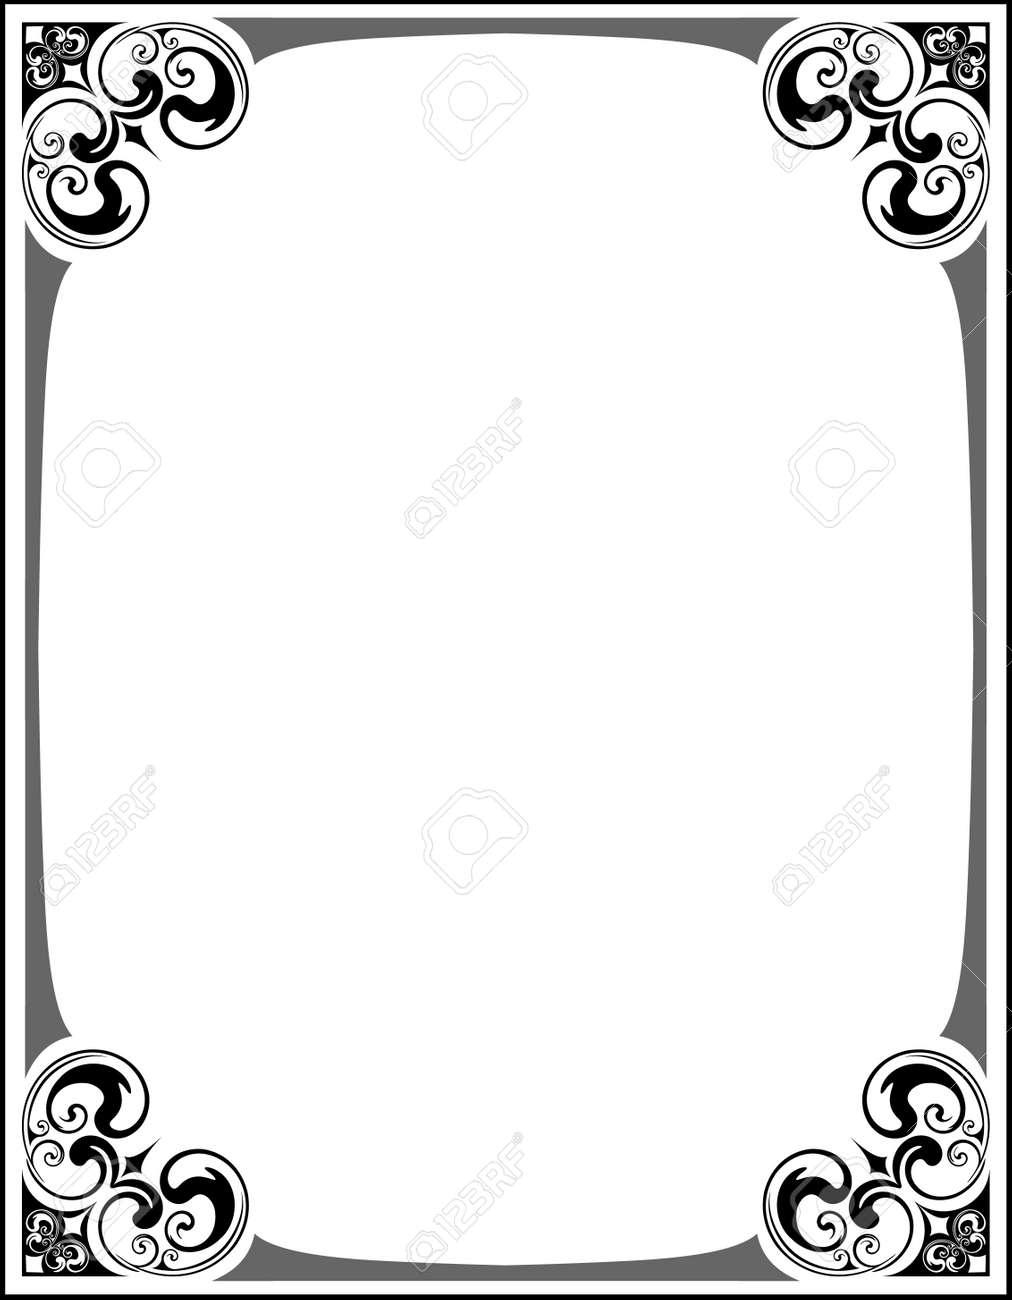 Elegant decorative frame. - 10707284